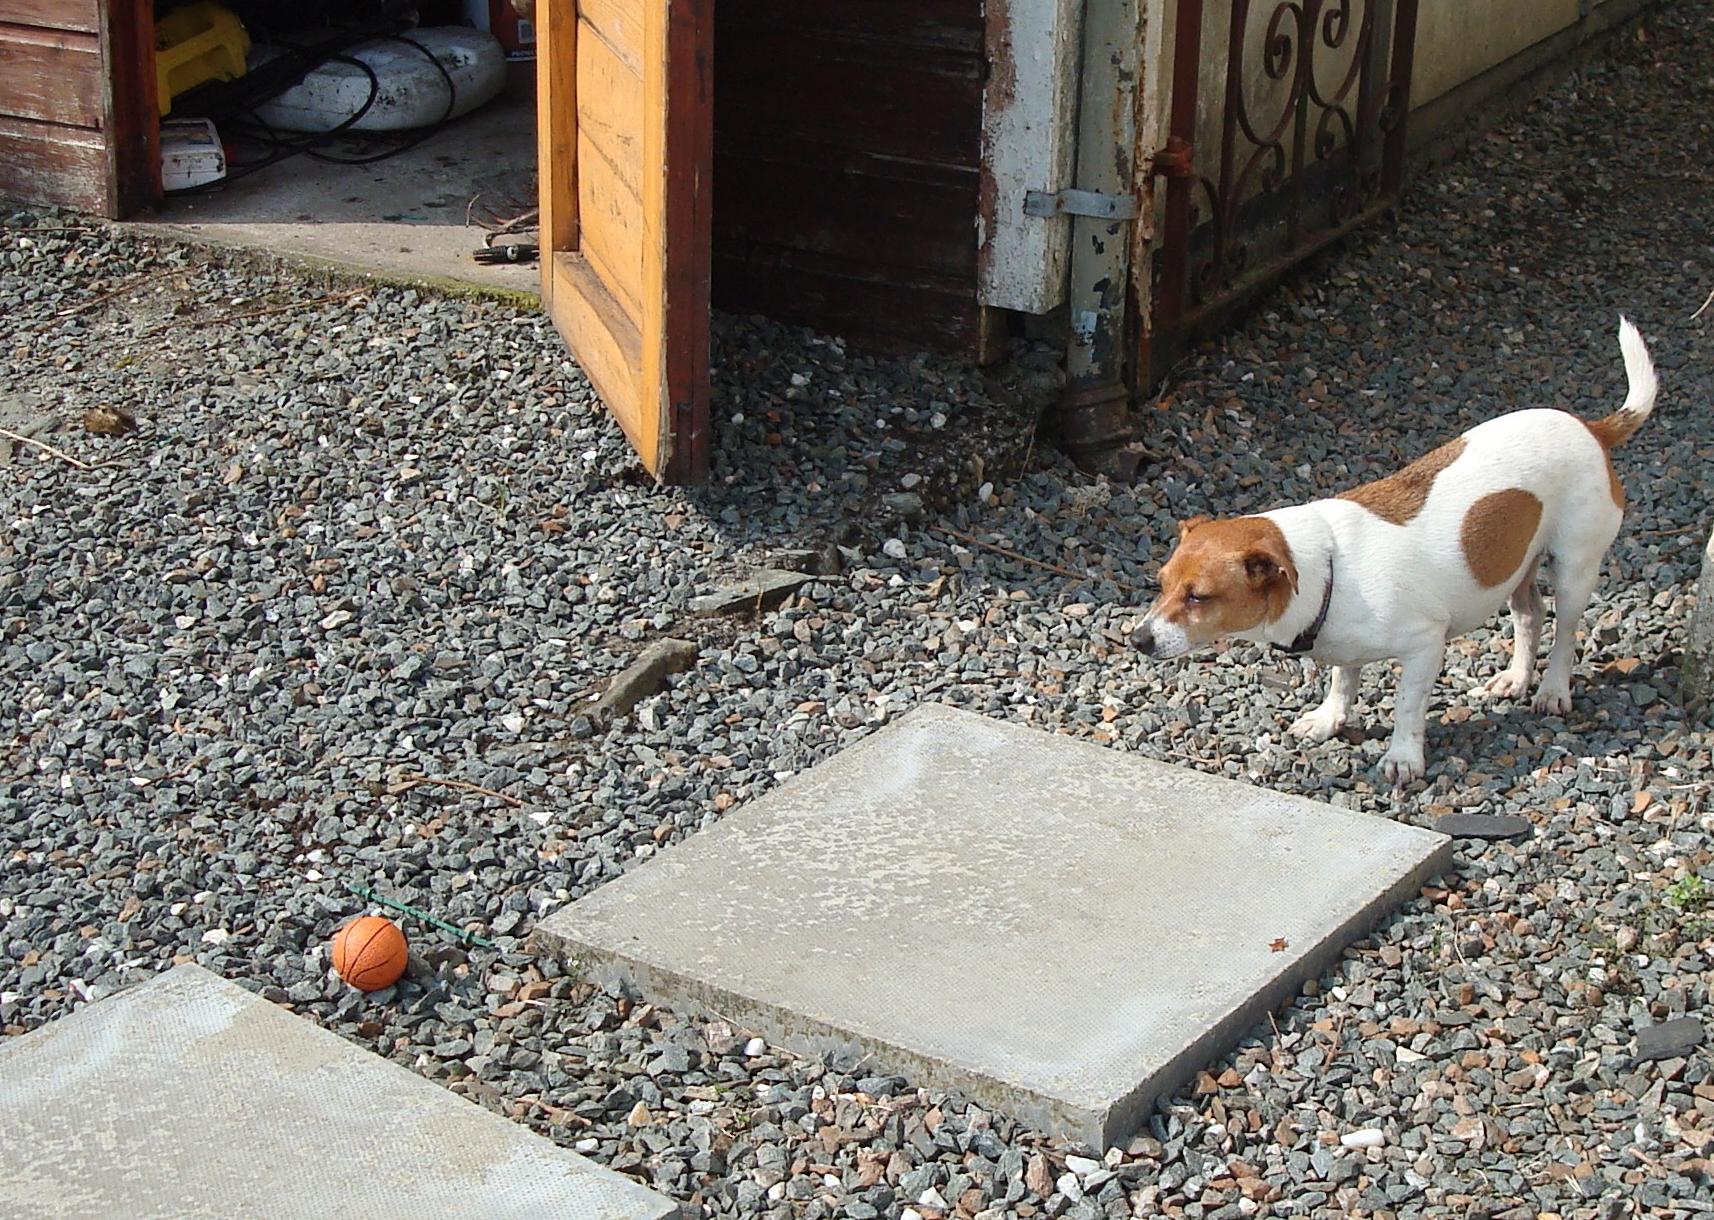 Dog watching a ball